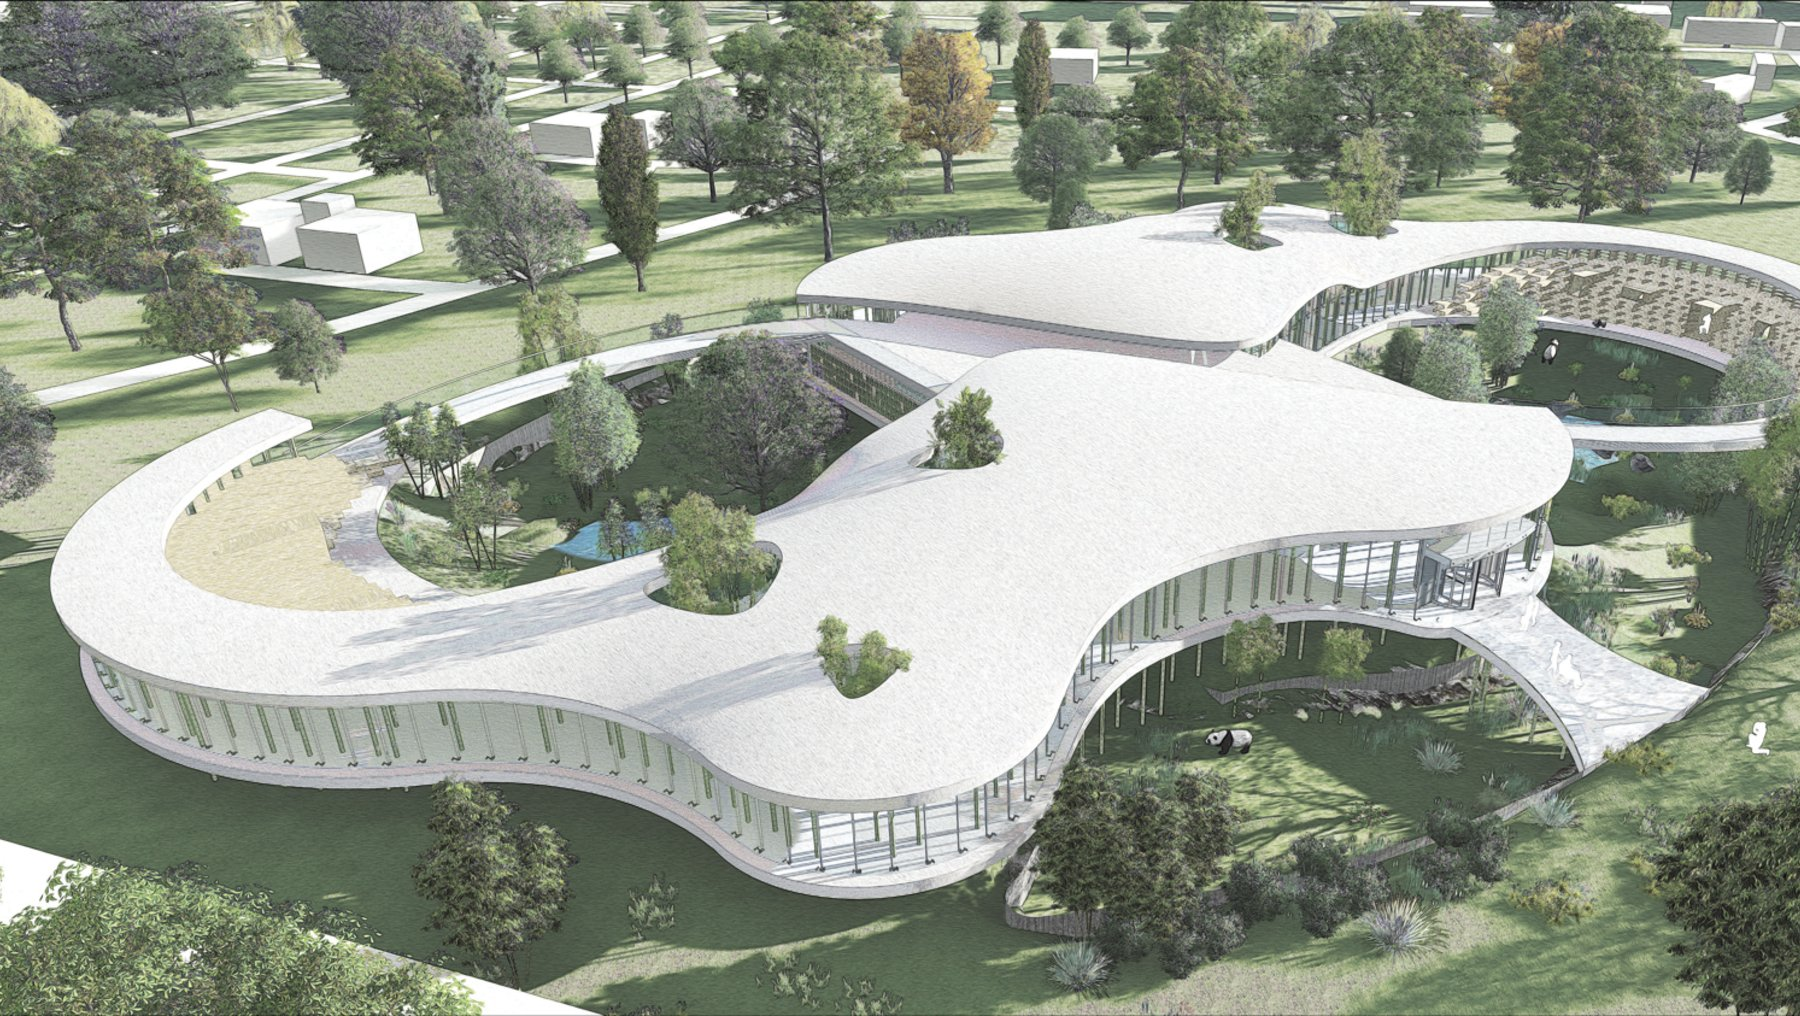 Pandahaus - Entwurf Mehmet Caferoglu